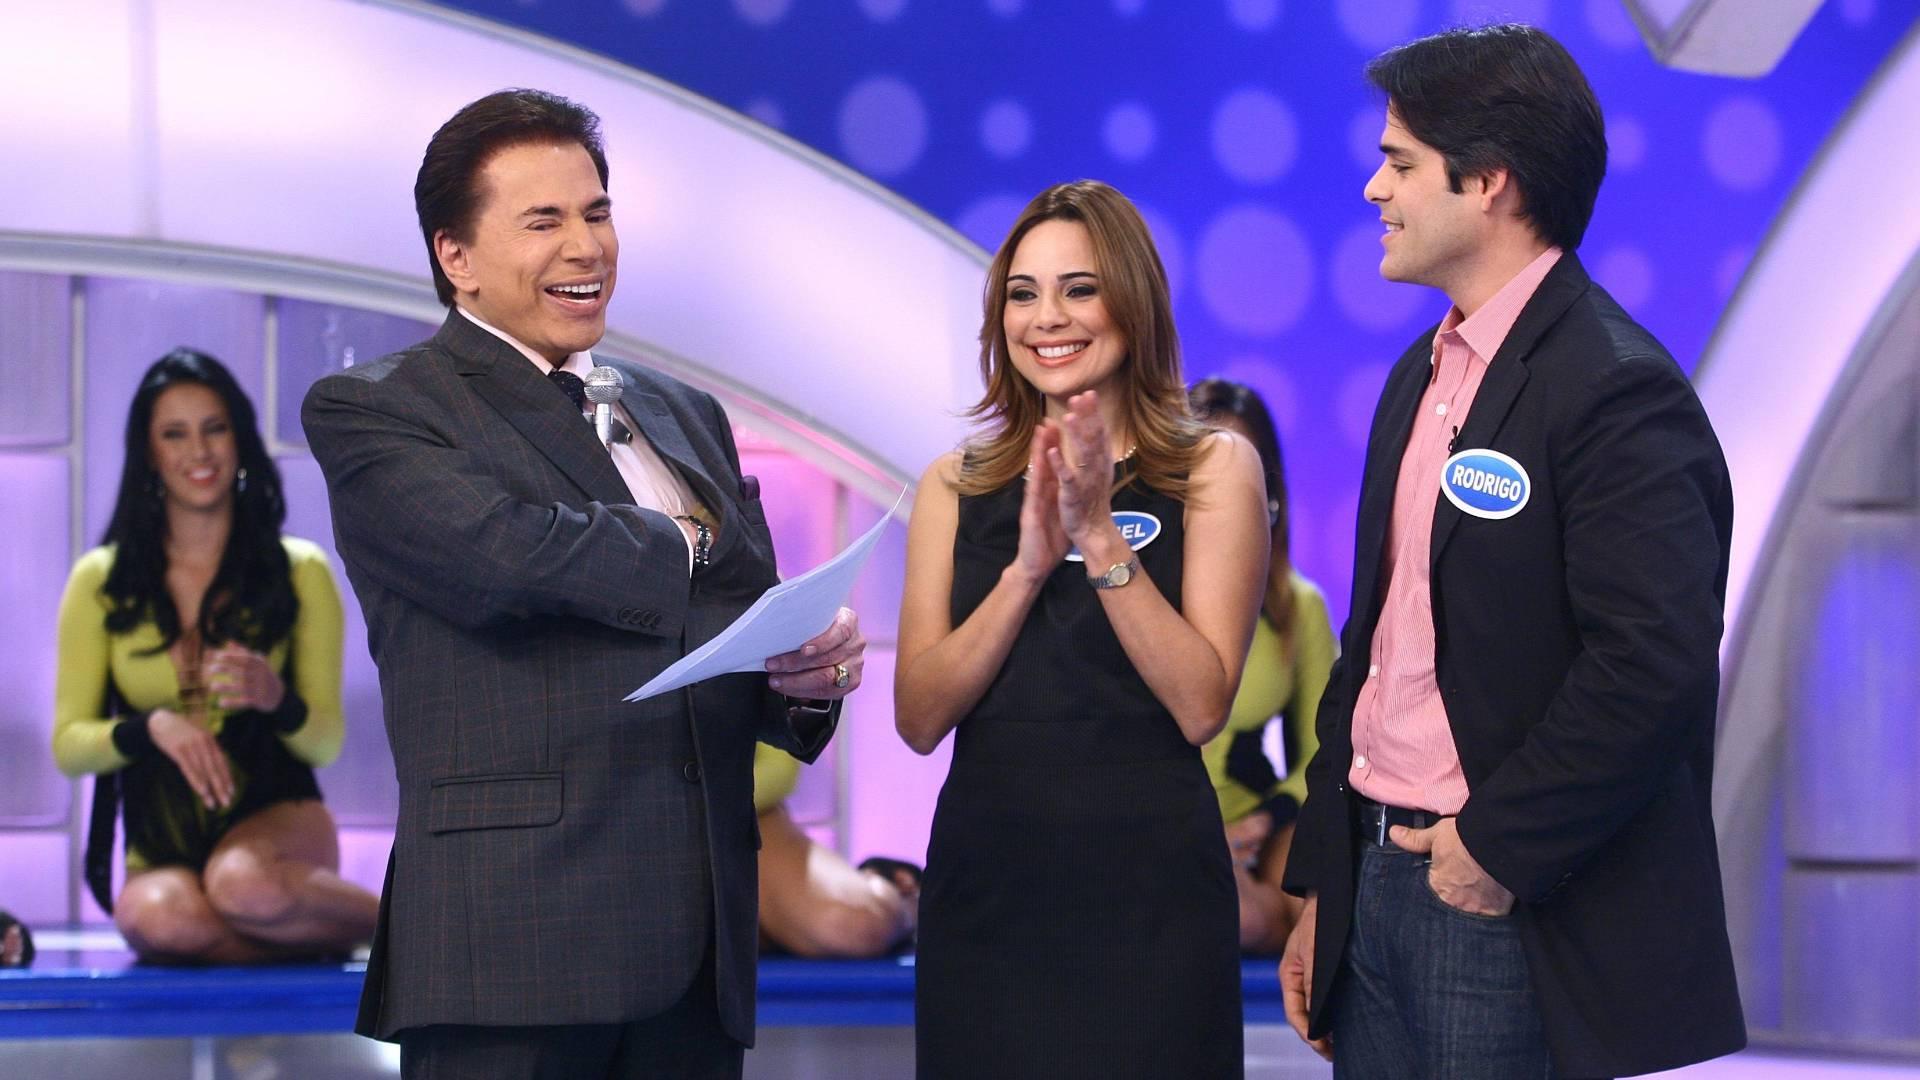 Silvio Santos recebe a jornalista Rachel Sheherazade e seu marido Rodrigo no